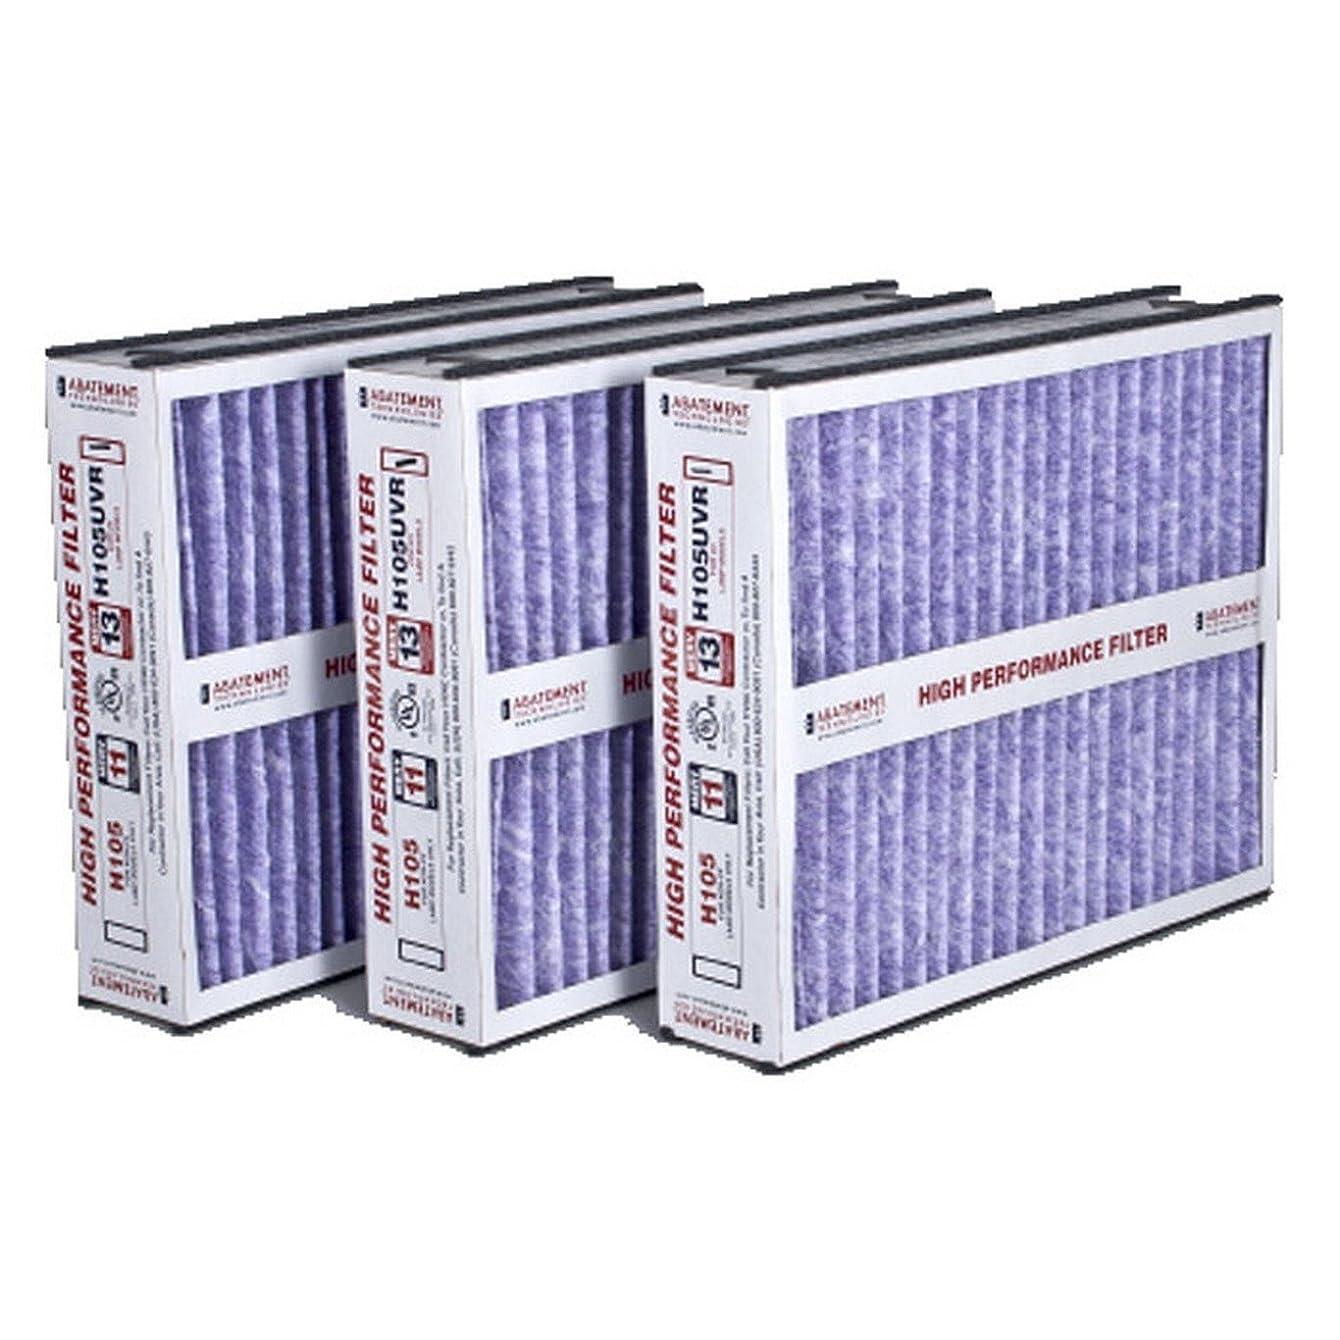 Abatement Technologies H105UVR-3 Filters for CAP100UV & CAP100UVP | 3 Filters